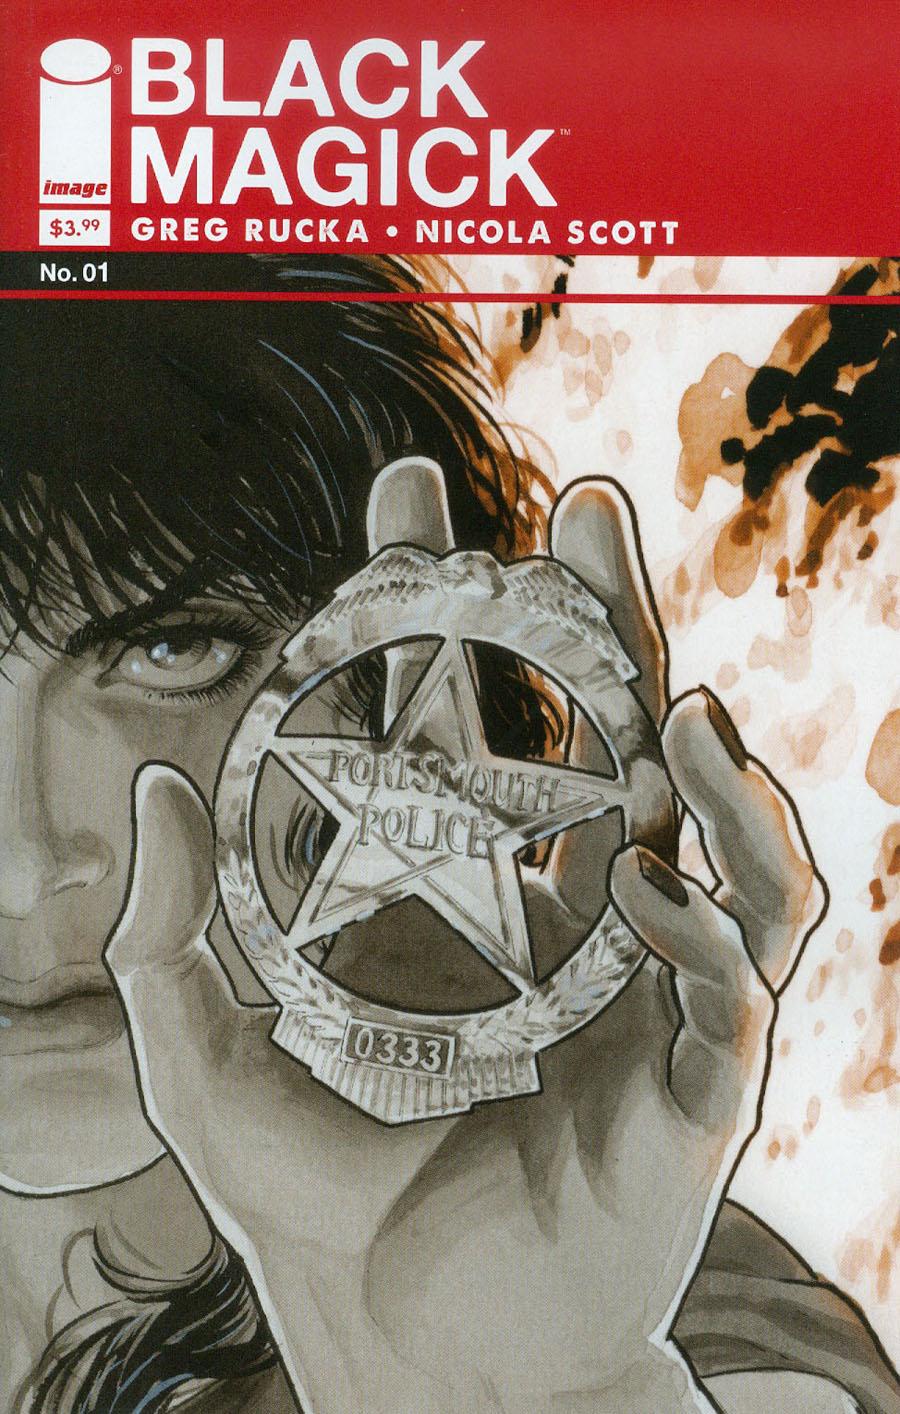 Black Magick #1 Cover A Regular Nicola Scott Comic-Sized Cover